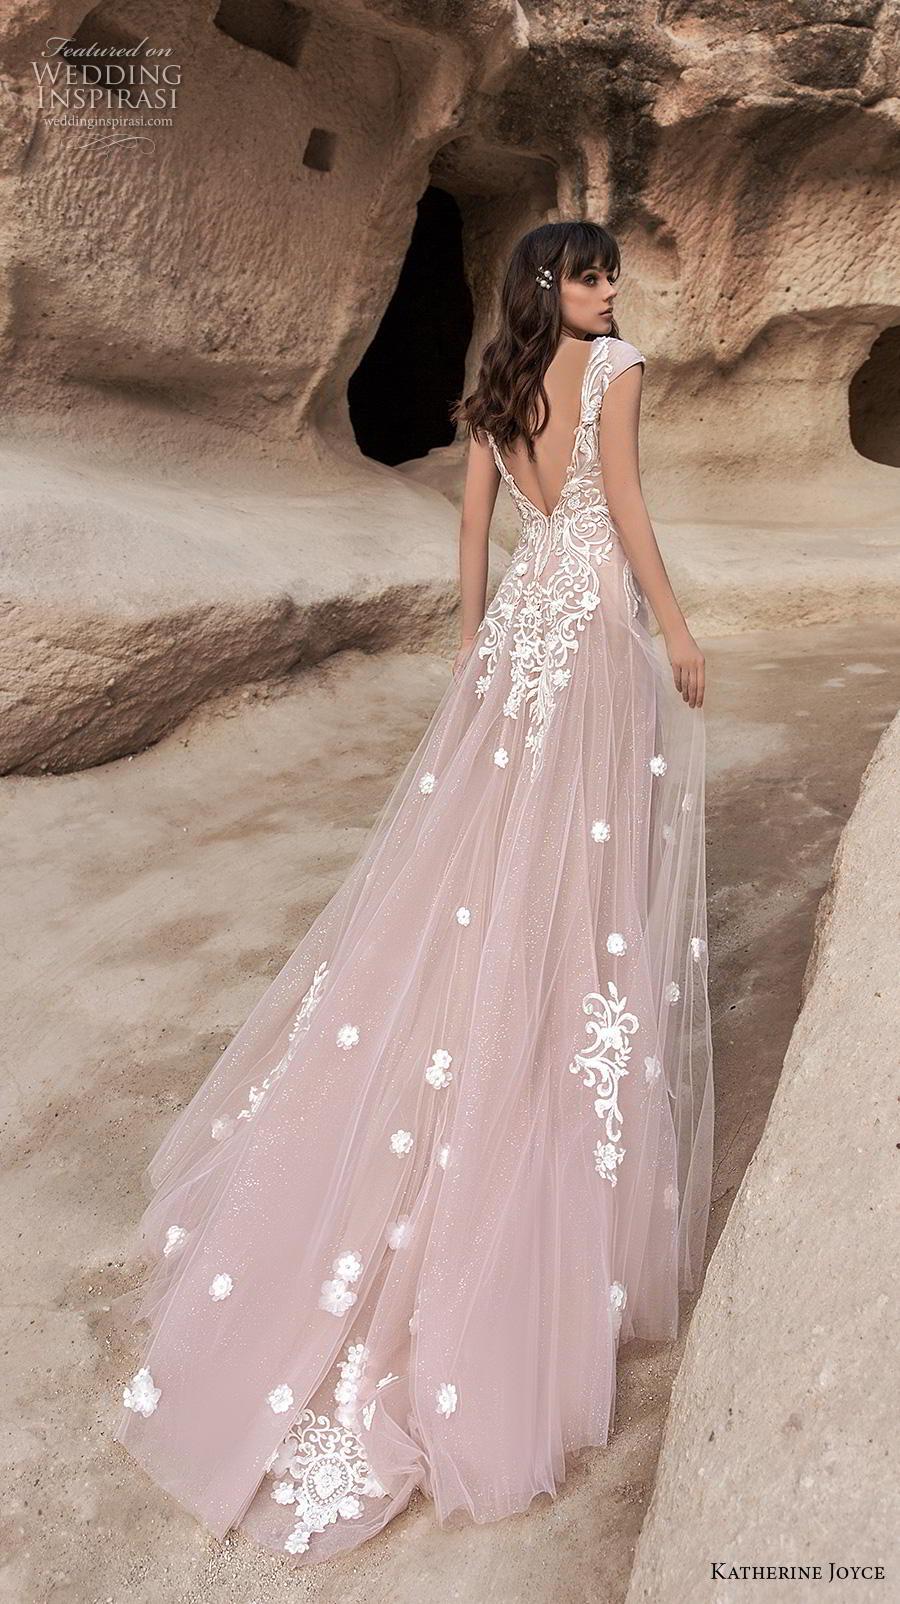 katherine joyce 2020 bridal cap sleeves illusion bateau v neck full embellishment romantic blush soft a  line wedding dress backless v back chapel train (2) bv